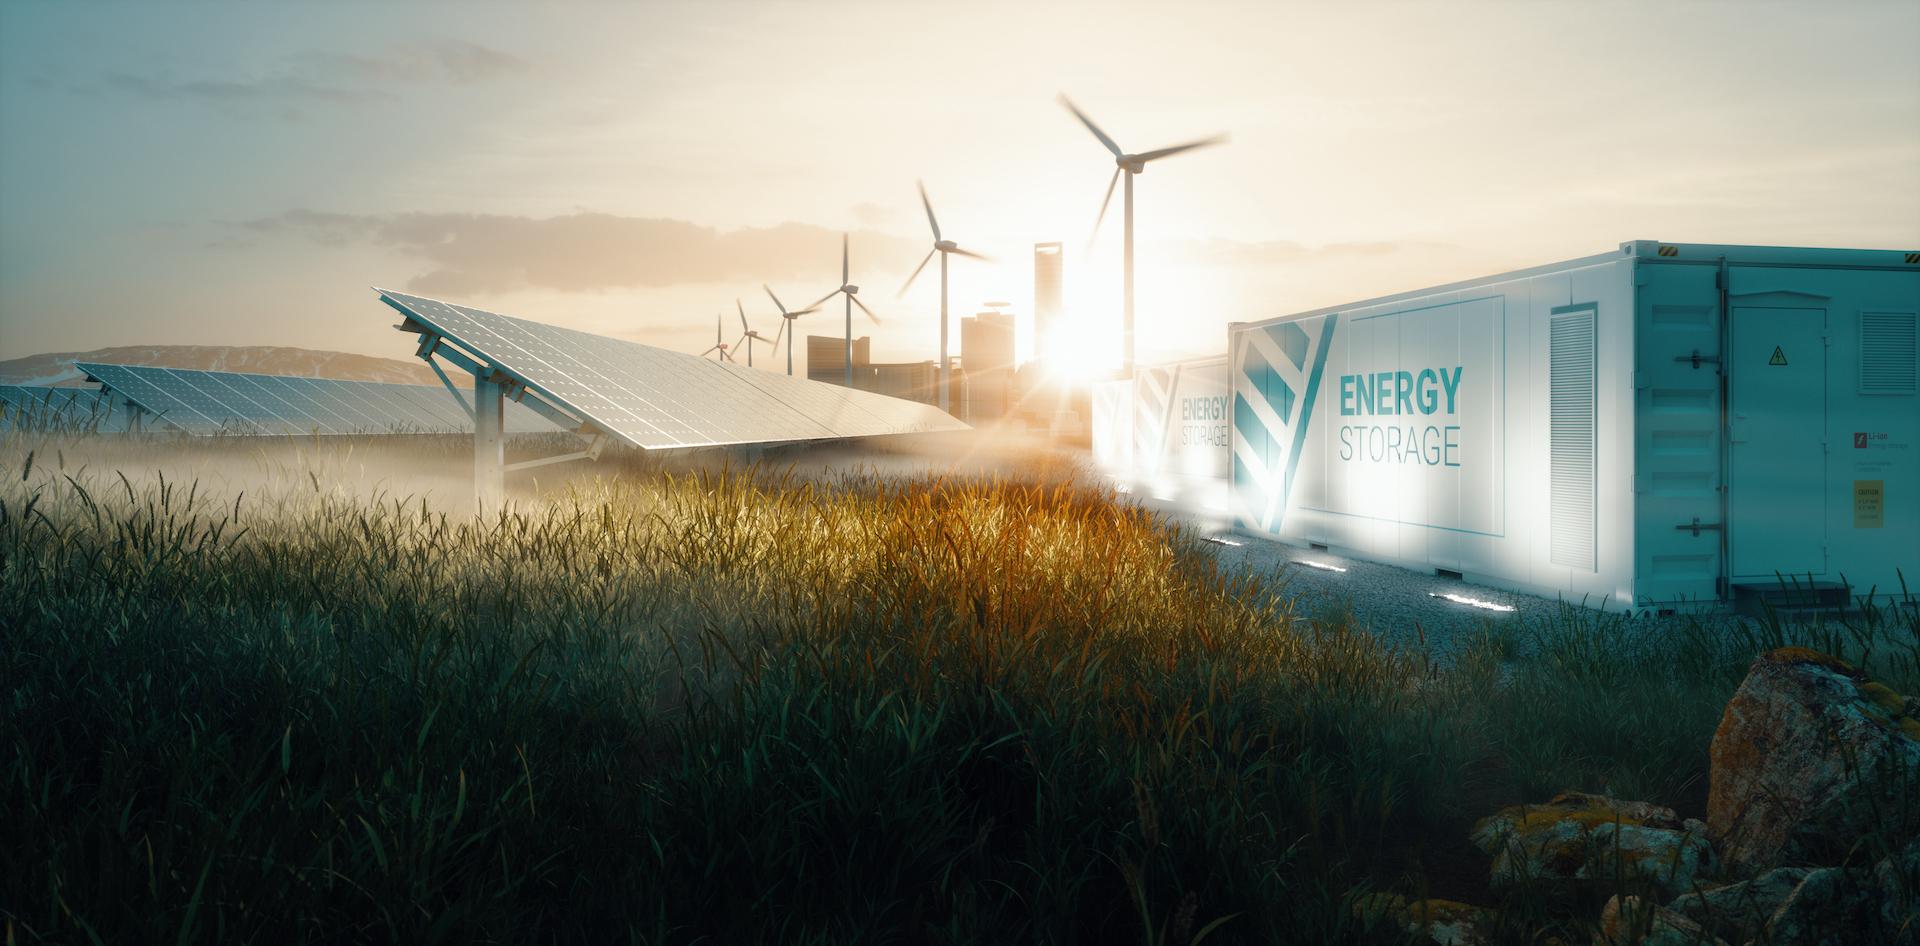 Houston Still A Tough Sell For Renewable Energy Funding